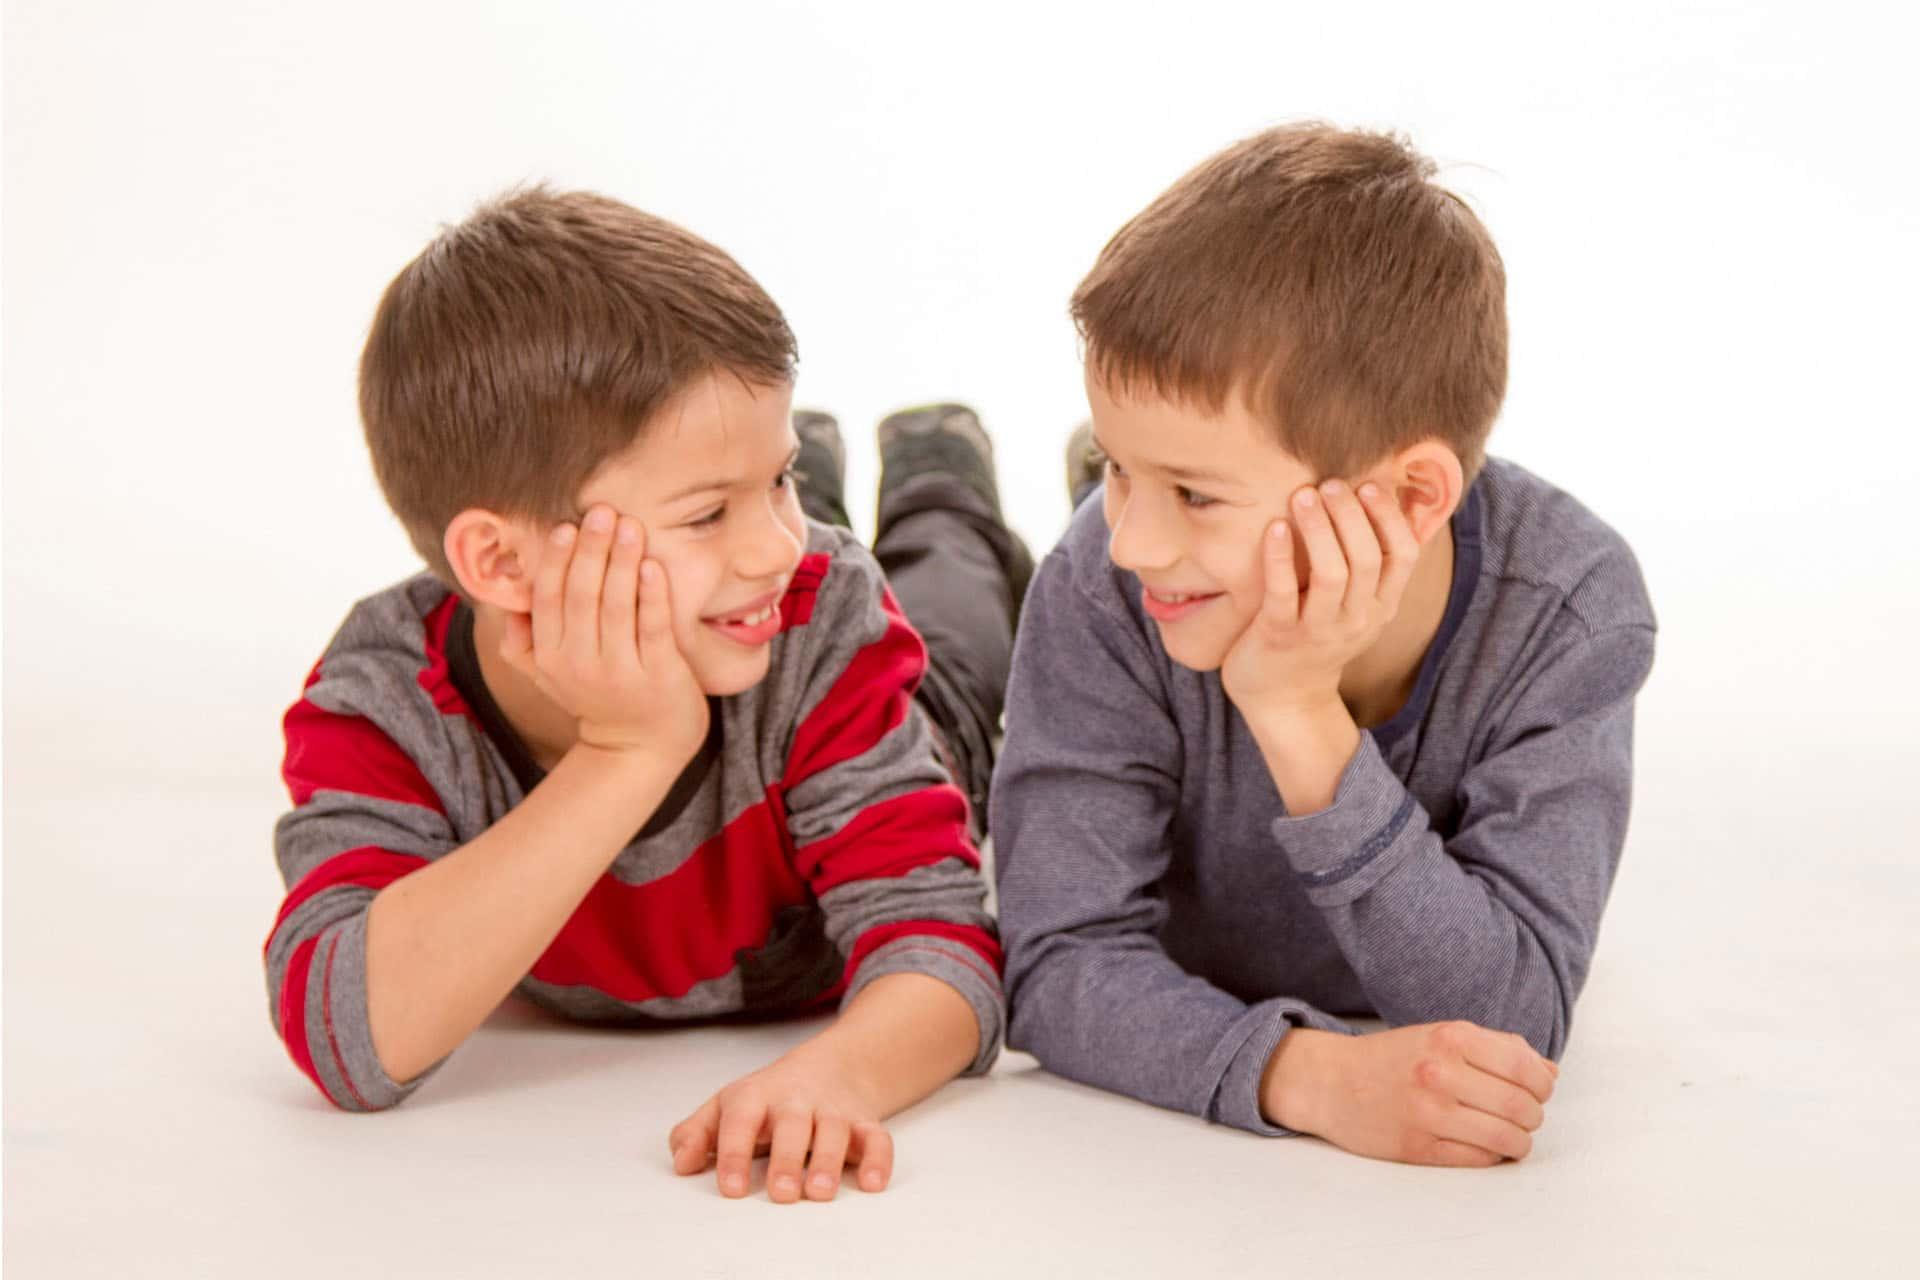 Kinderfotos - Kinderfotografie - Foto Stoess Murnau